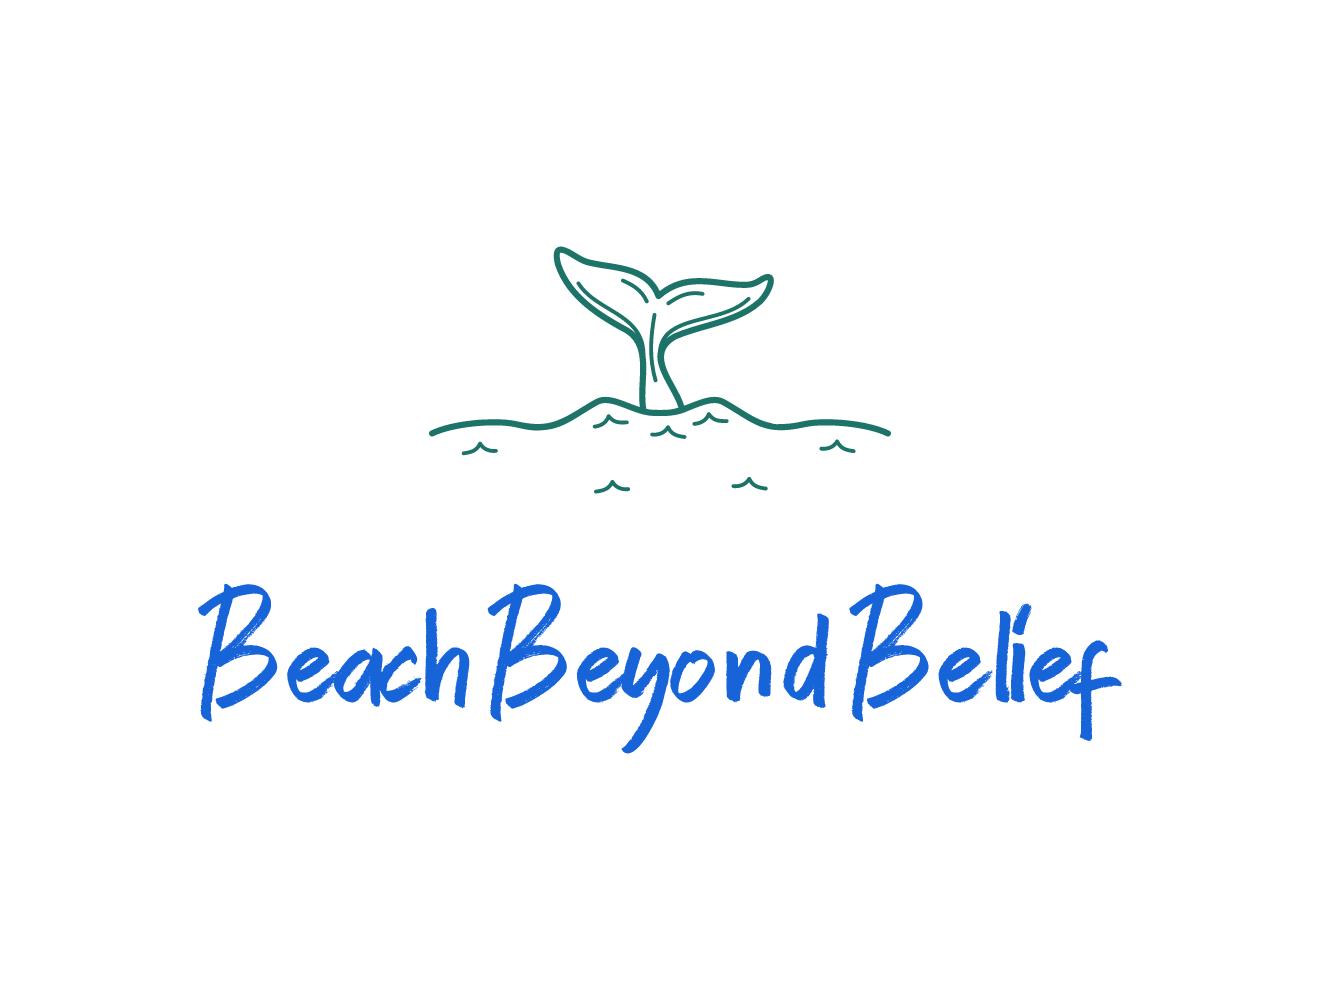 Beach Beyond Belief House